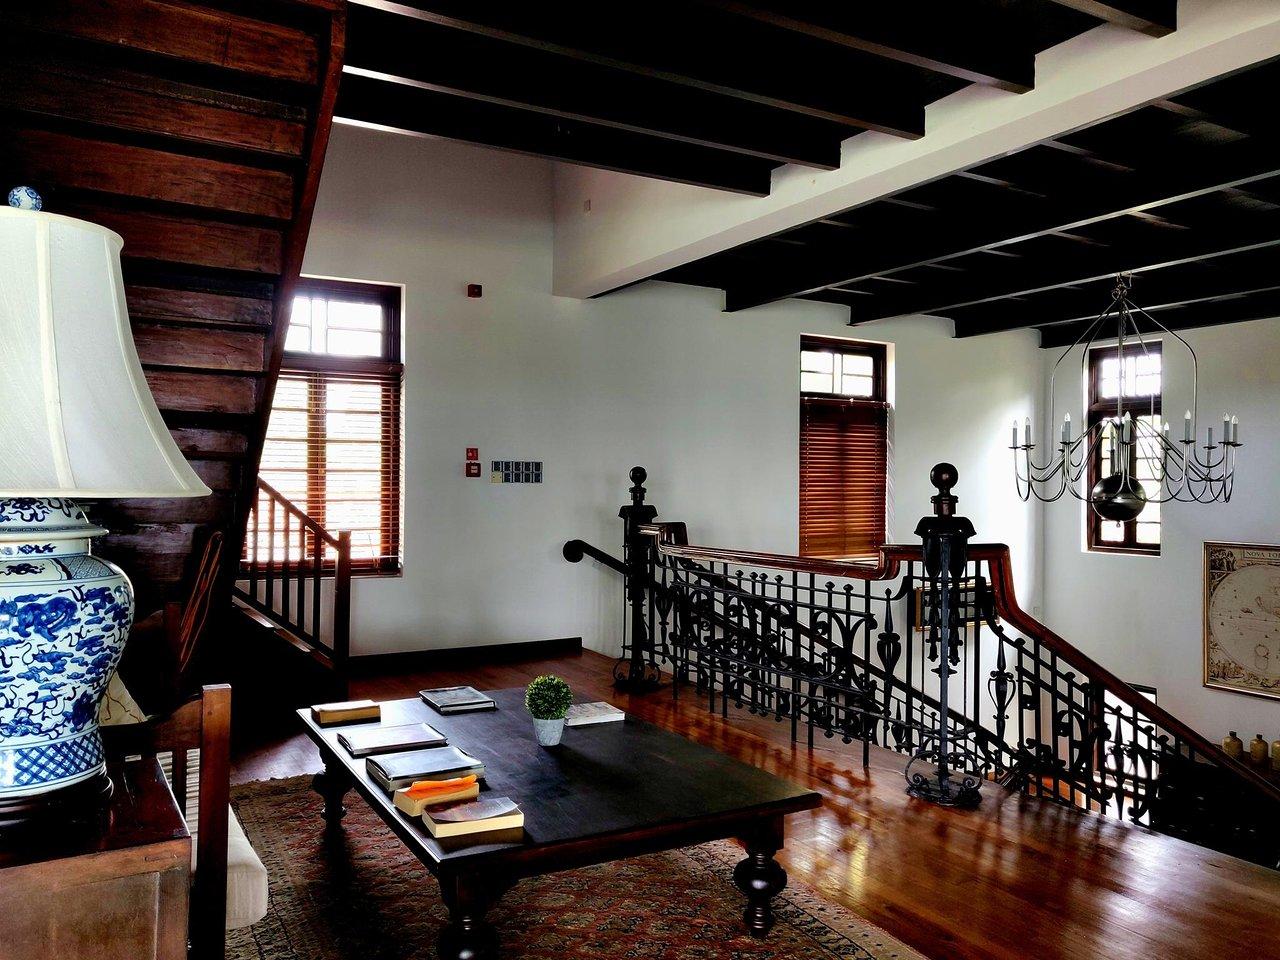 cinima villa com 2019